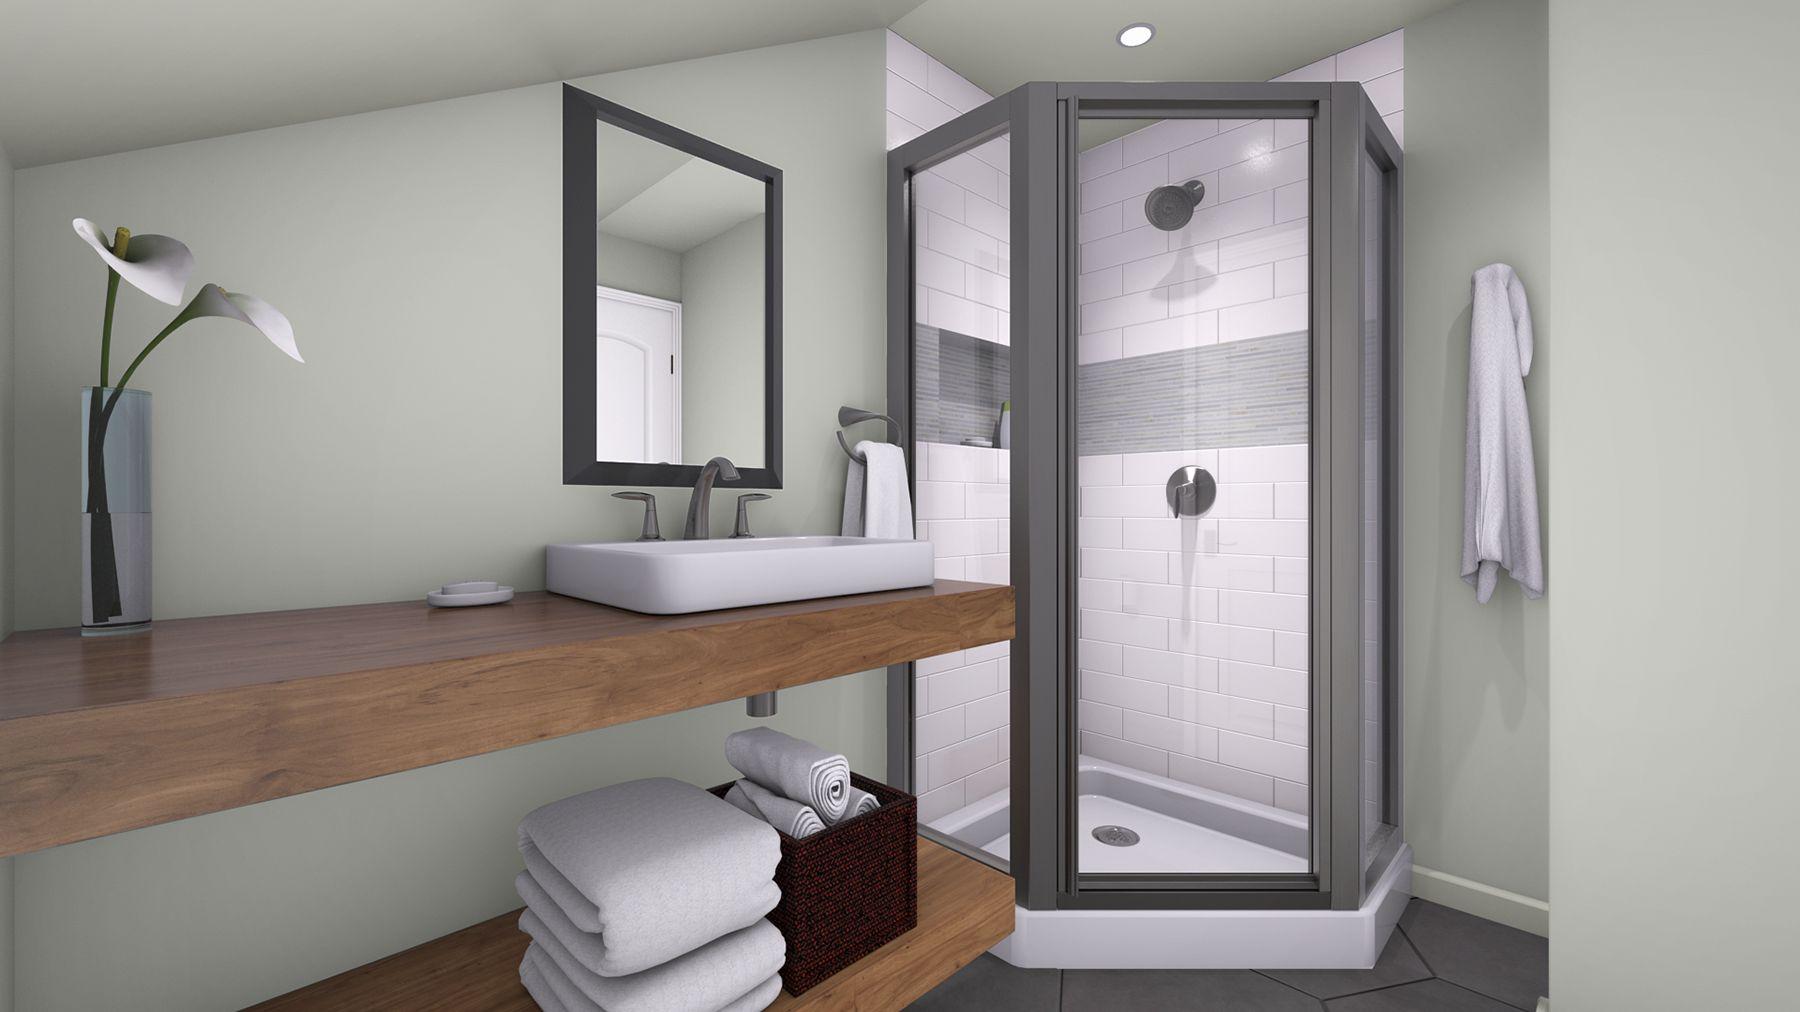 kohler bathroom design service kohler kohler bathrooms designs bathroom